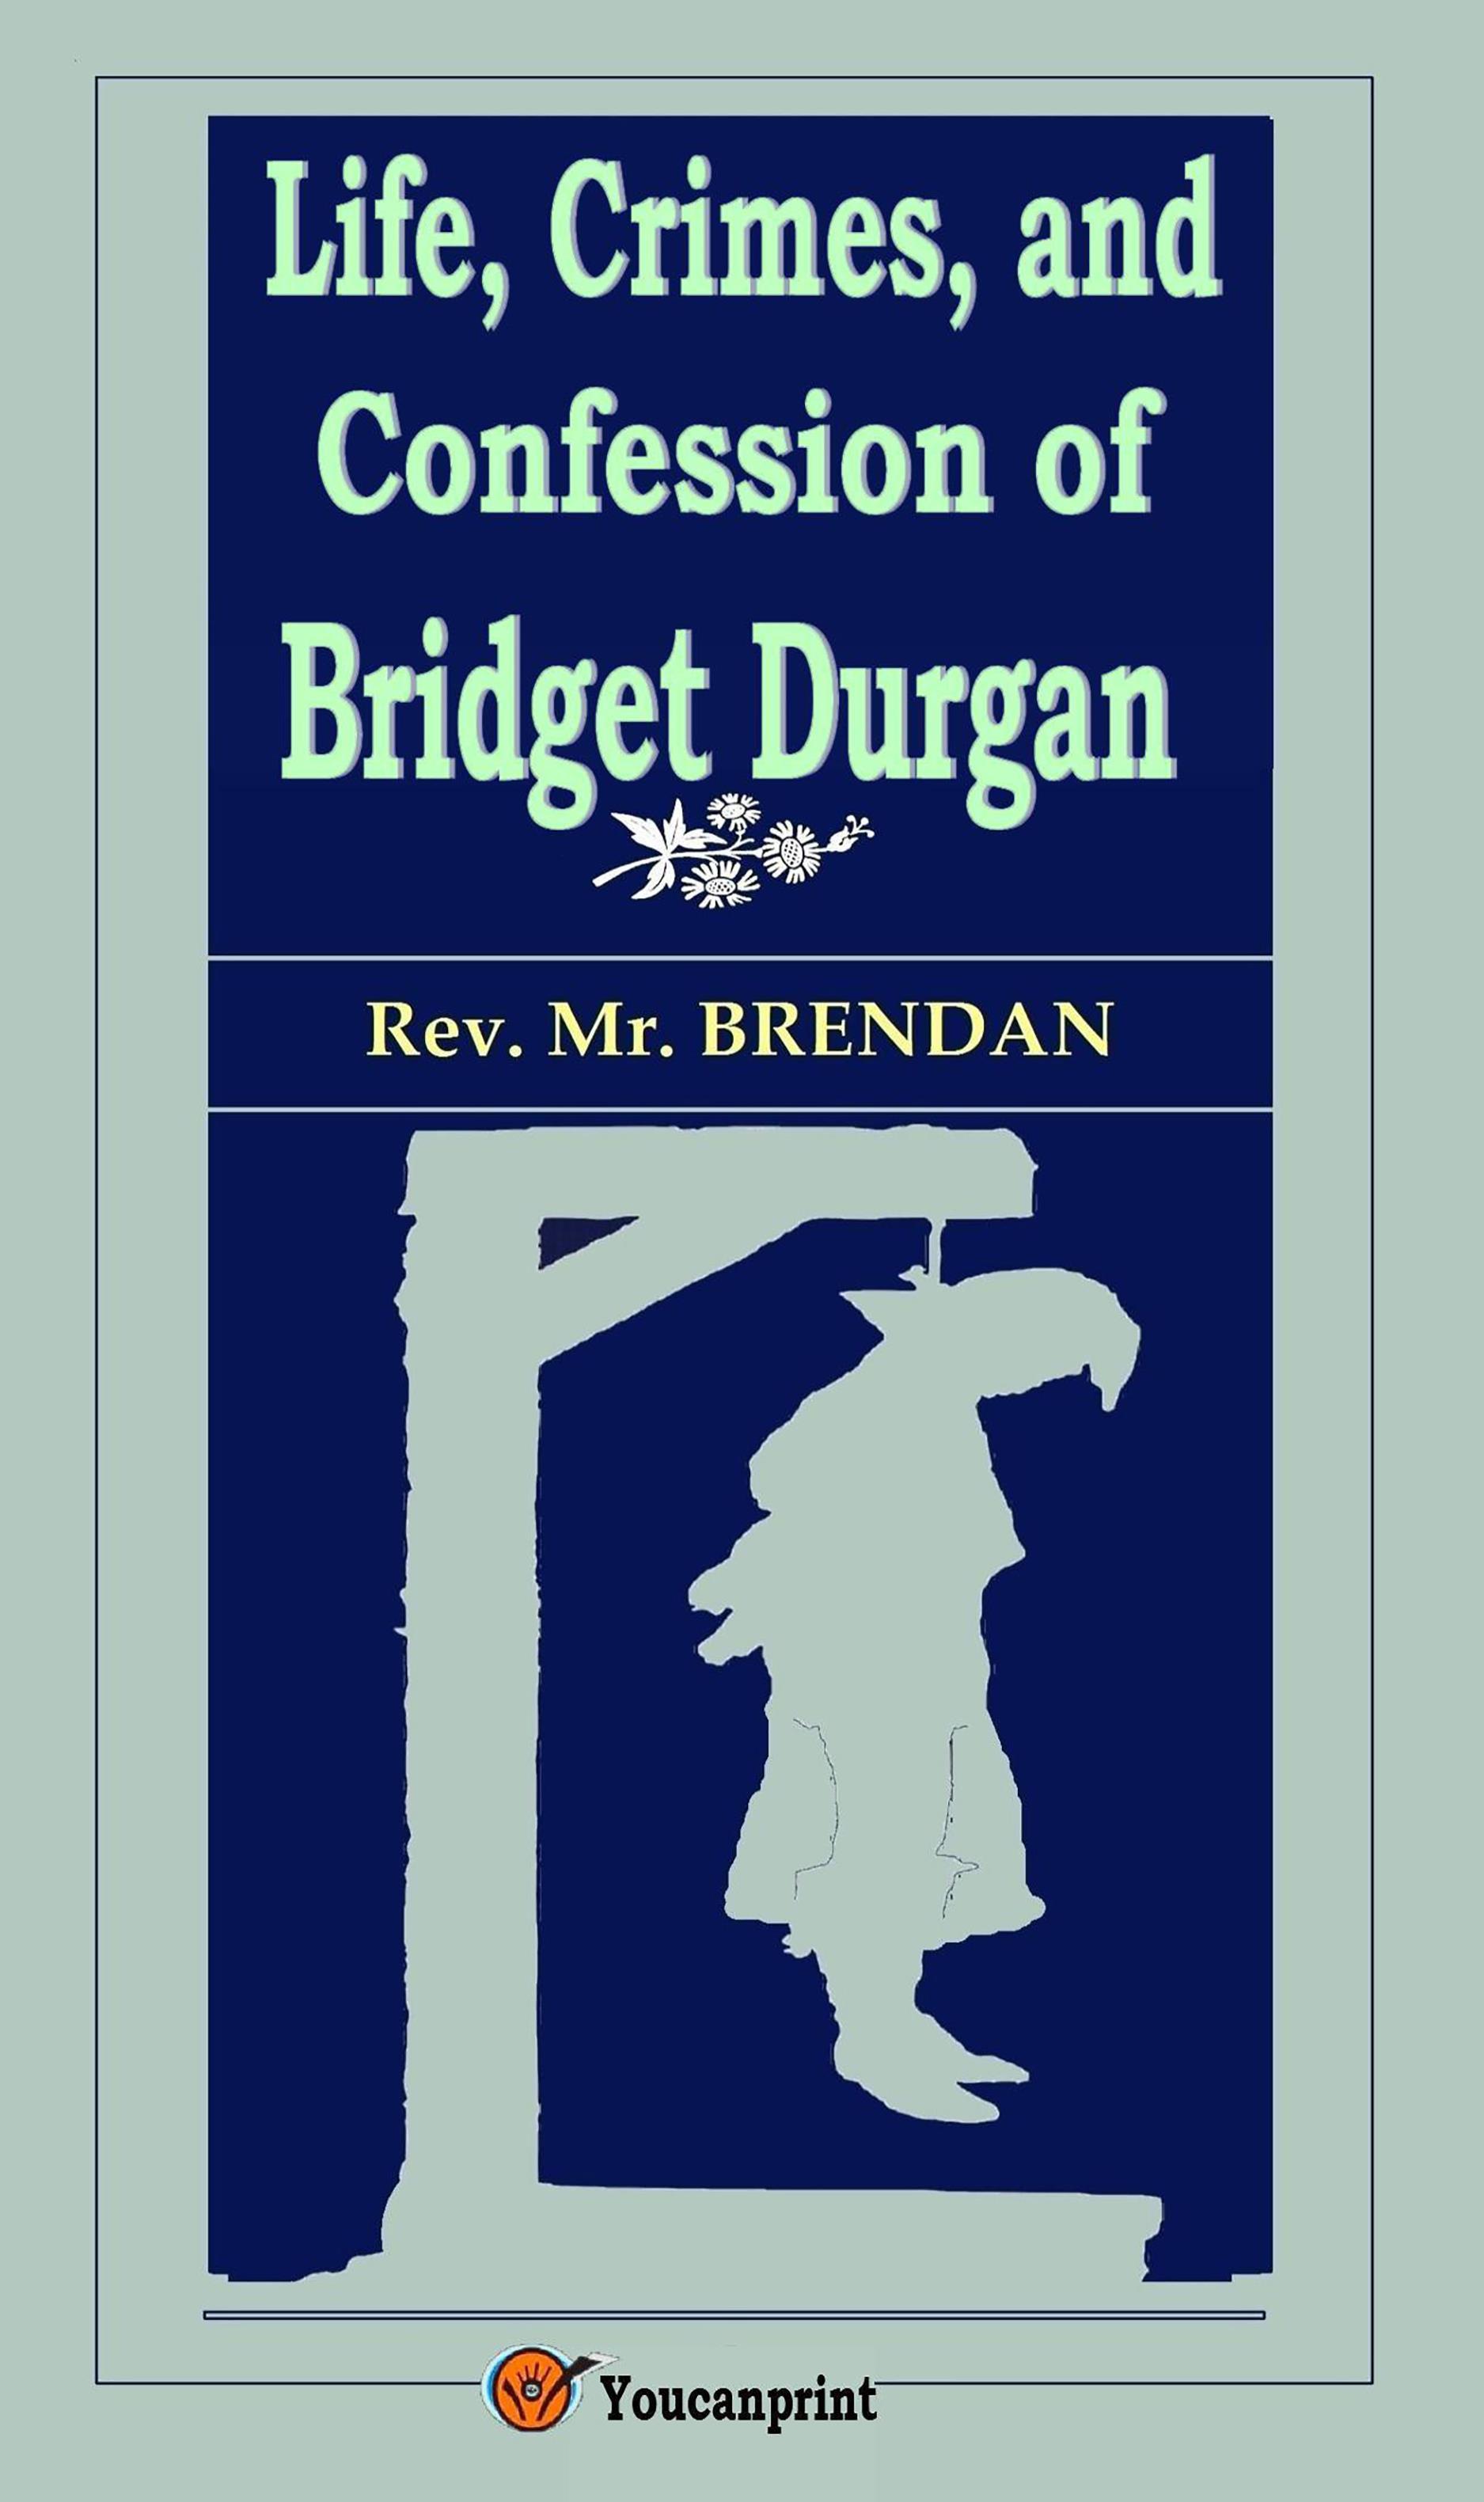 Life, Crimes, and Confession of Bridget Durgan (Illustrated)